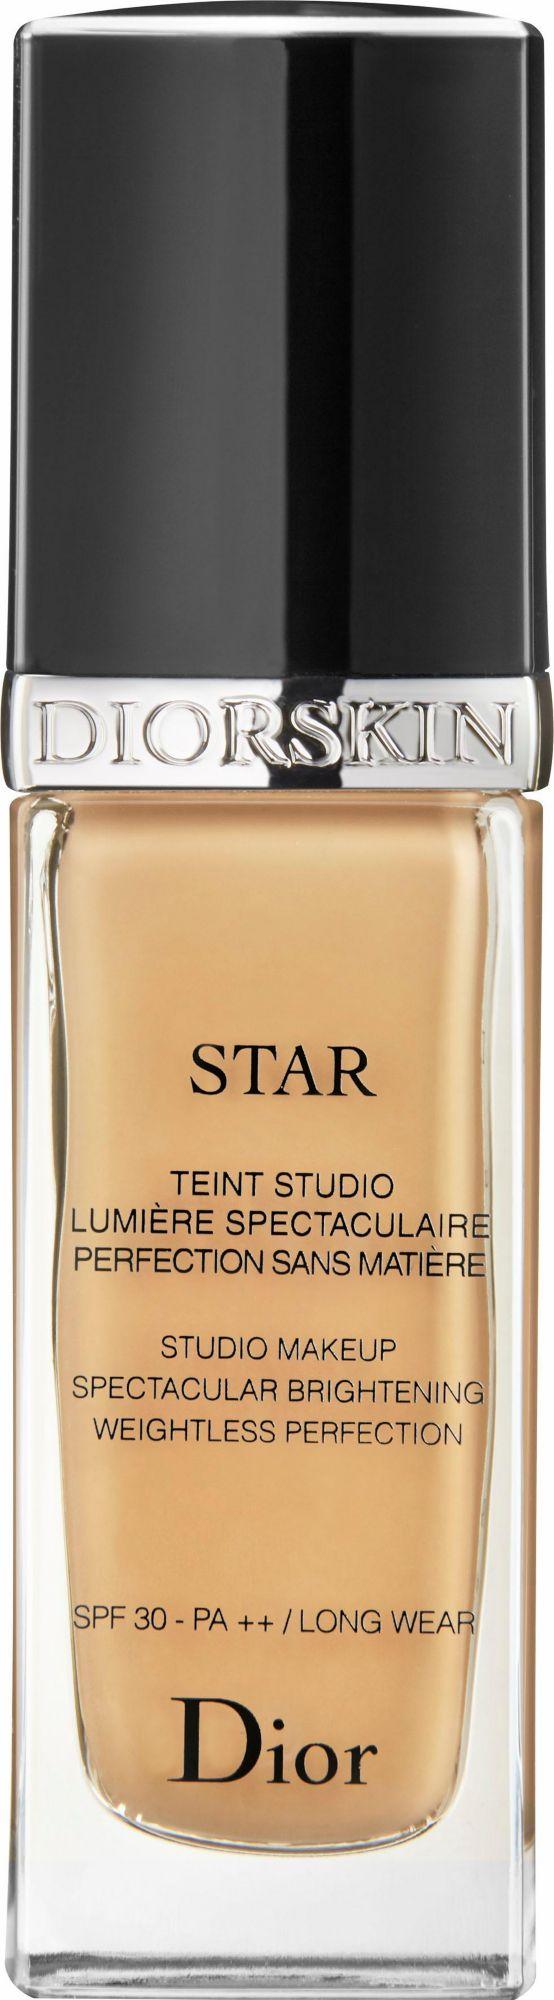 DIOR Dior, »Diorskin Star«, Foundation